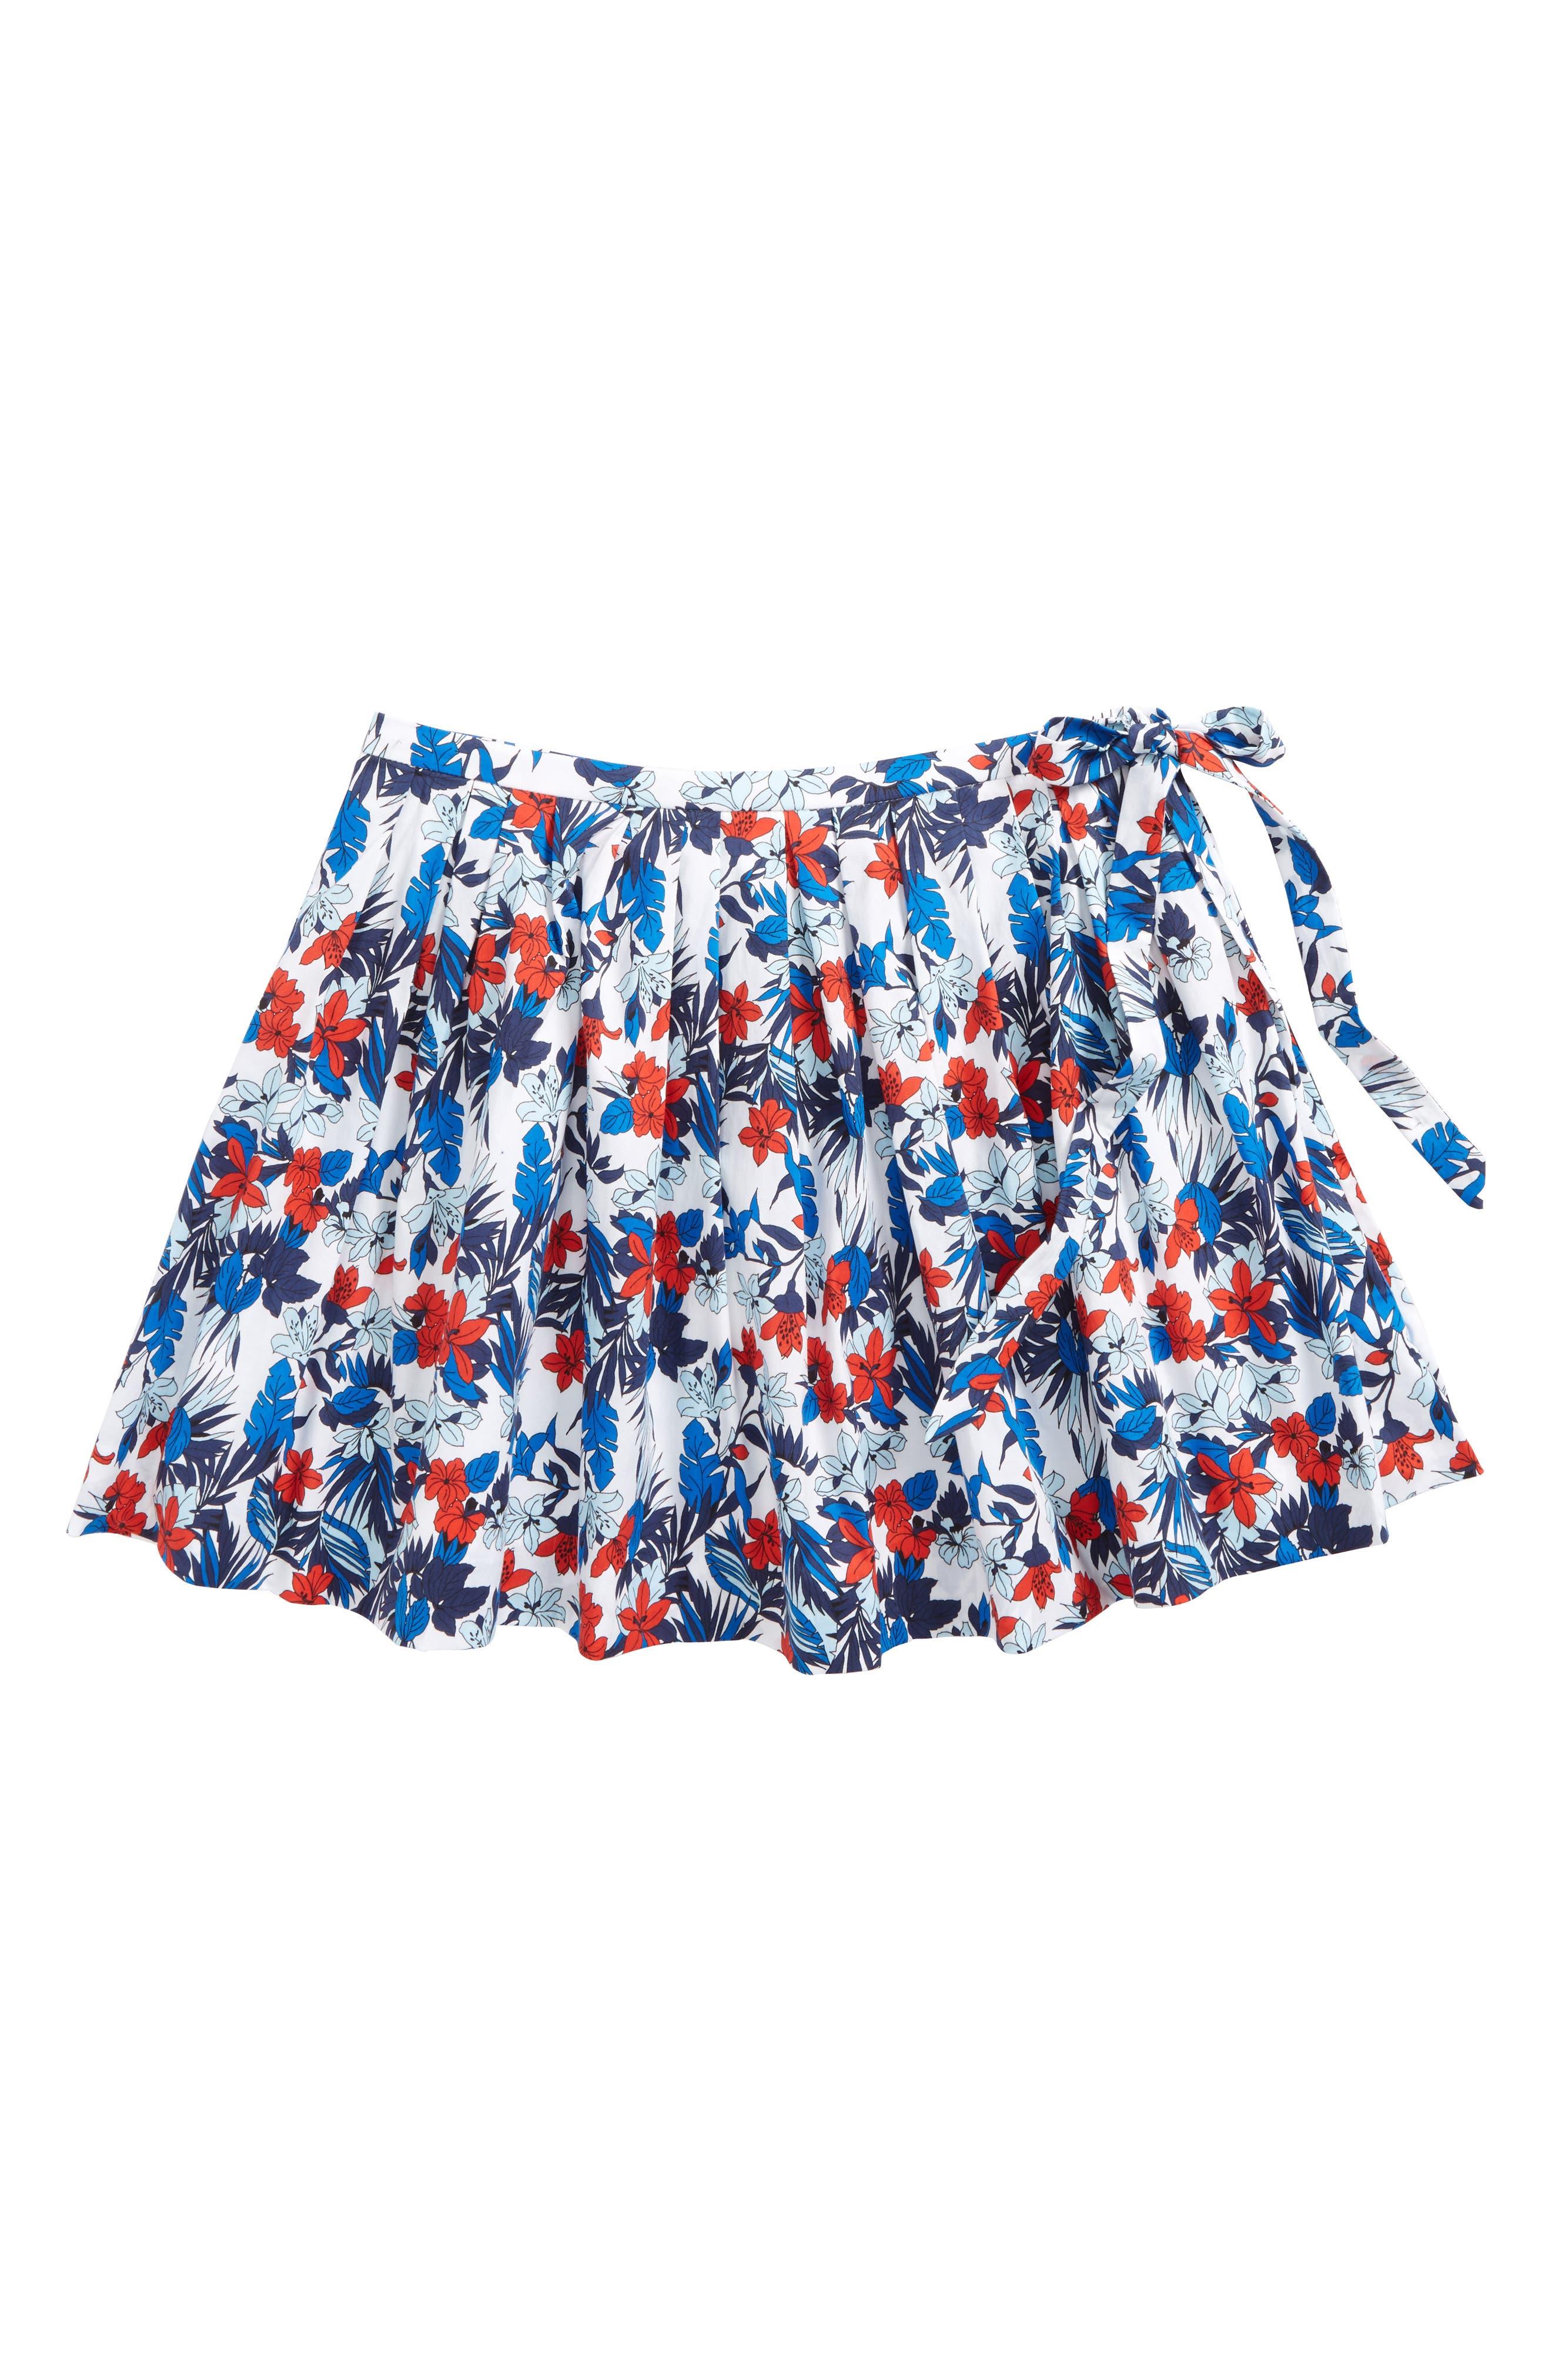 Alternate Image 1 Selected - Milly Minis Wrap Skirt (Big Girls)